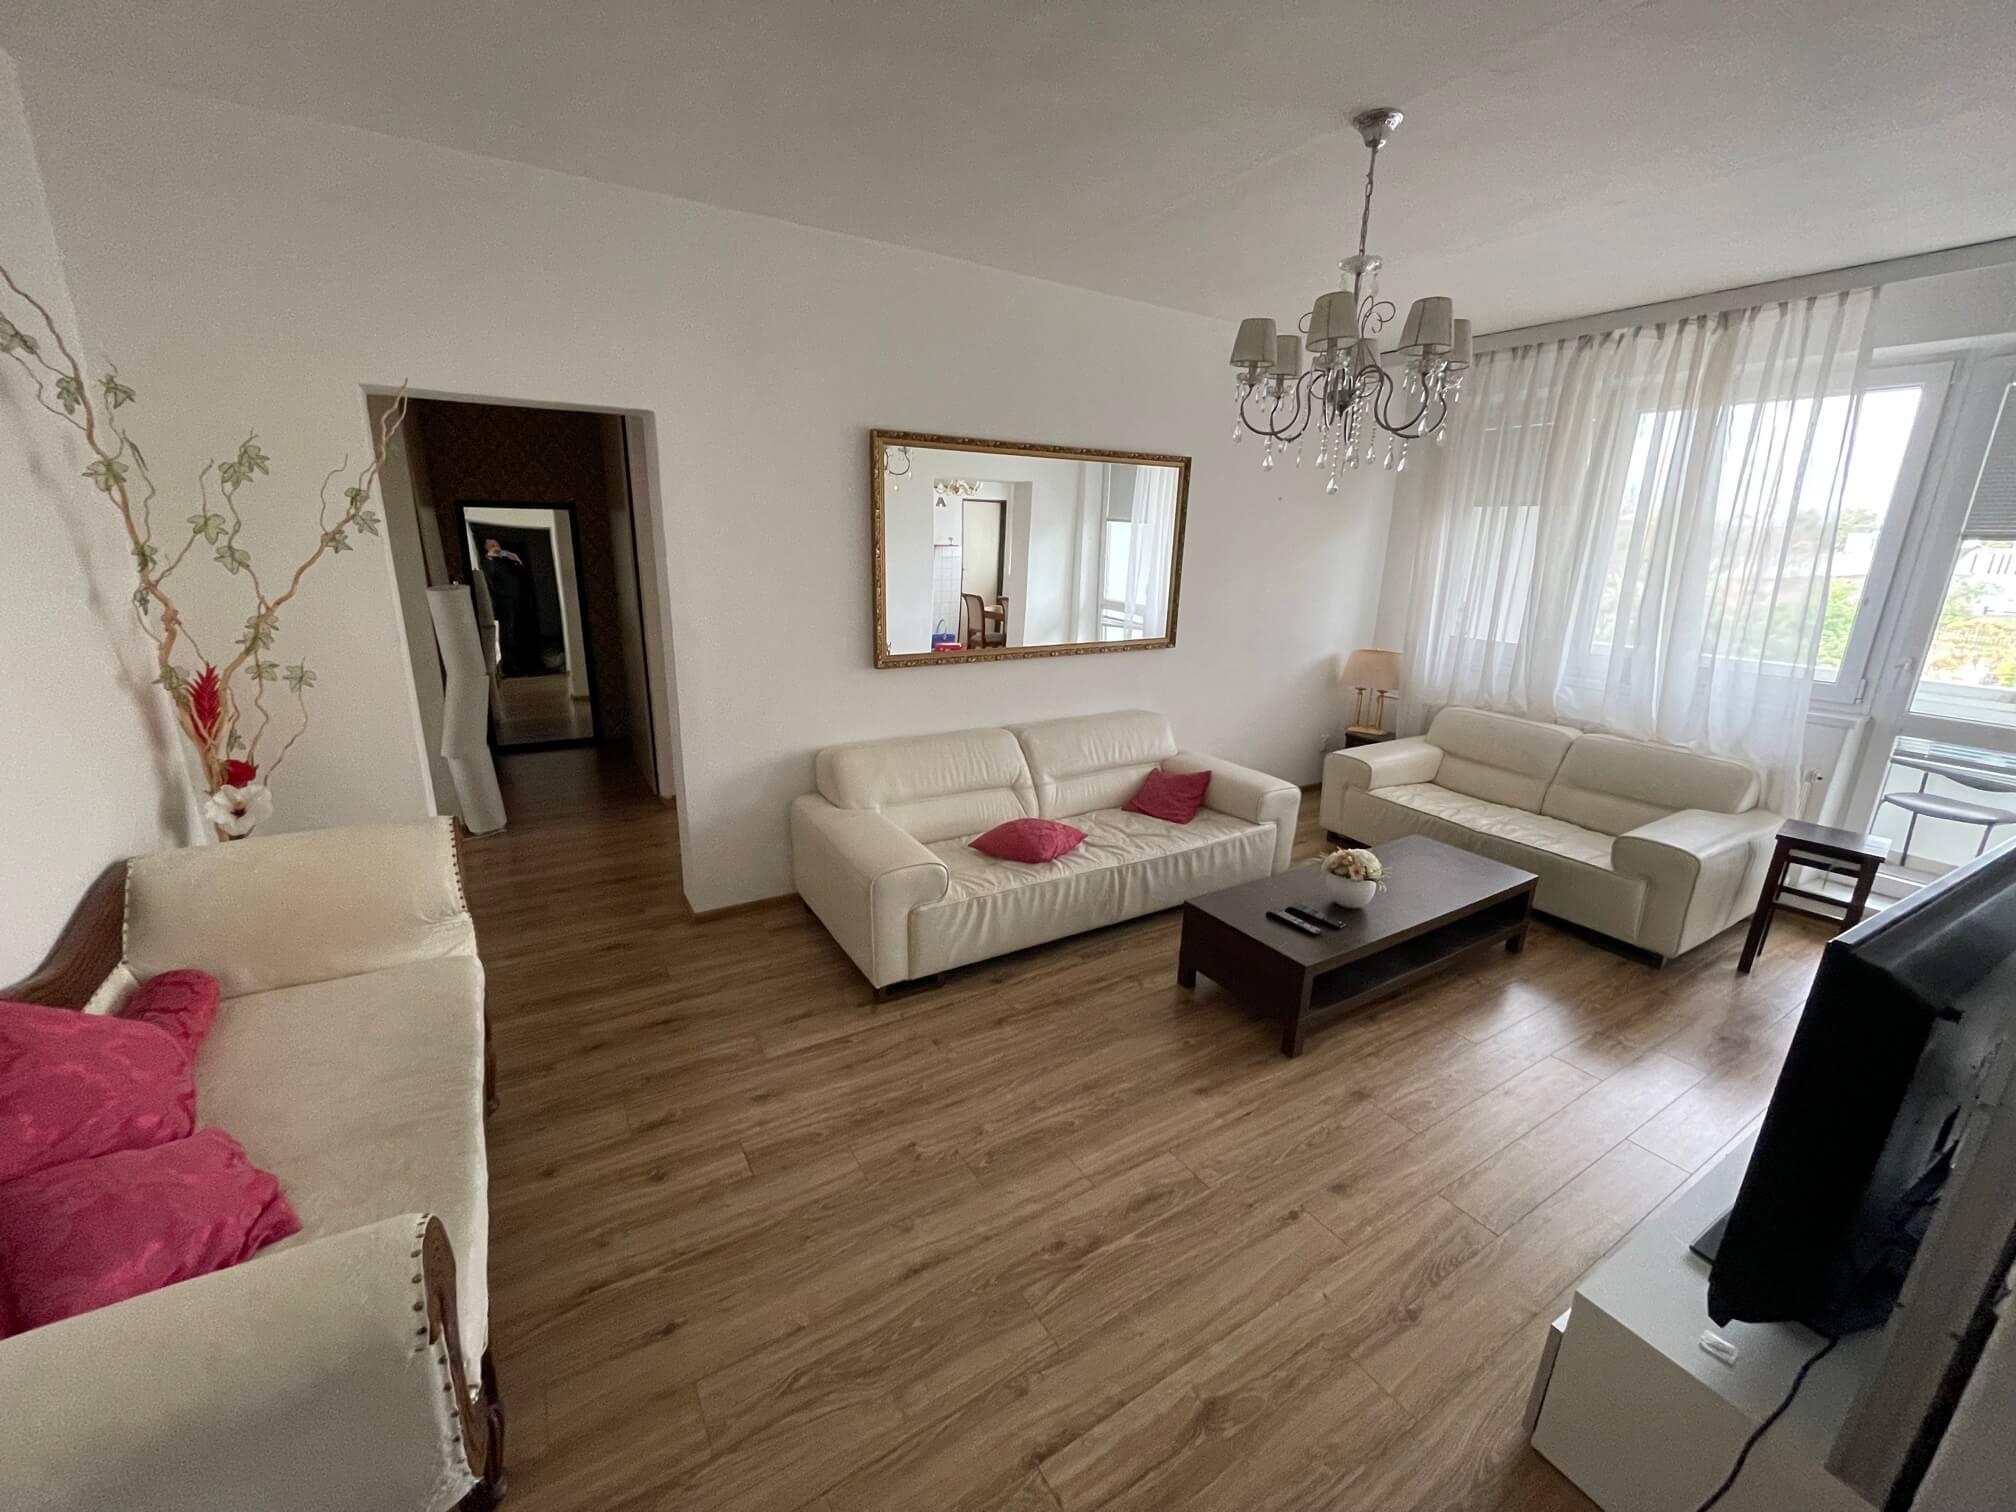 Exkluzívne na prenájom 3 izbový byt, 83m2, 2x loggia 4,5m2, Karolovka, Janotová 8-15